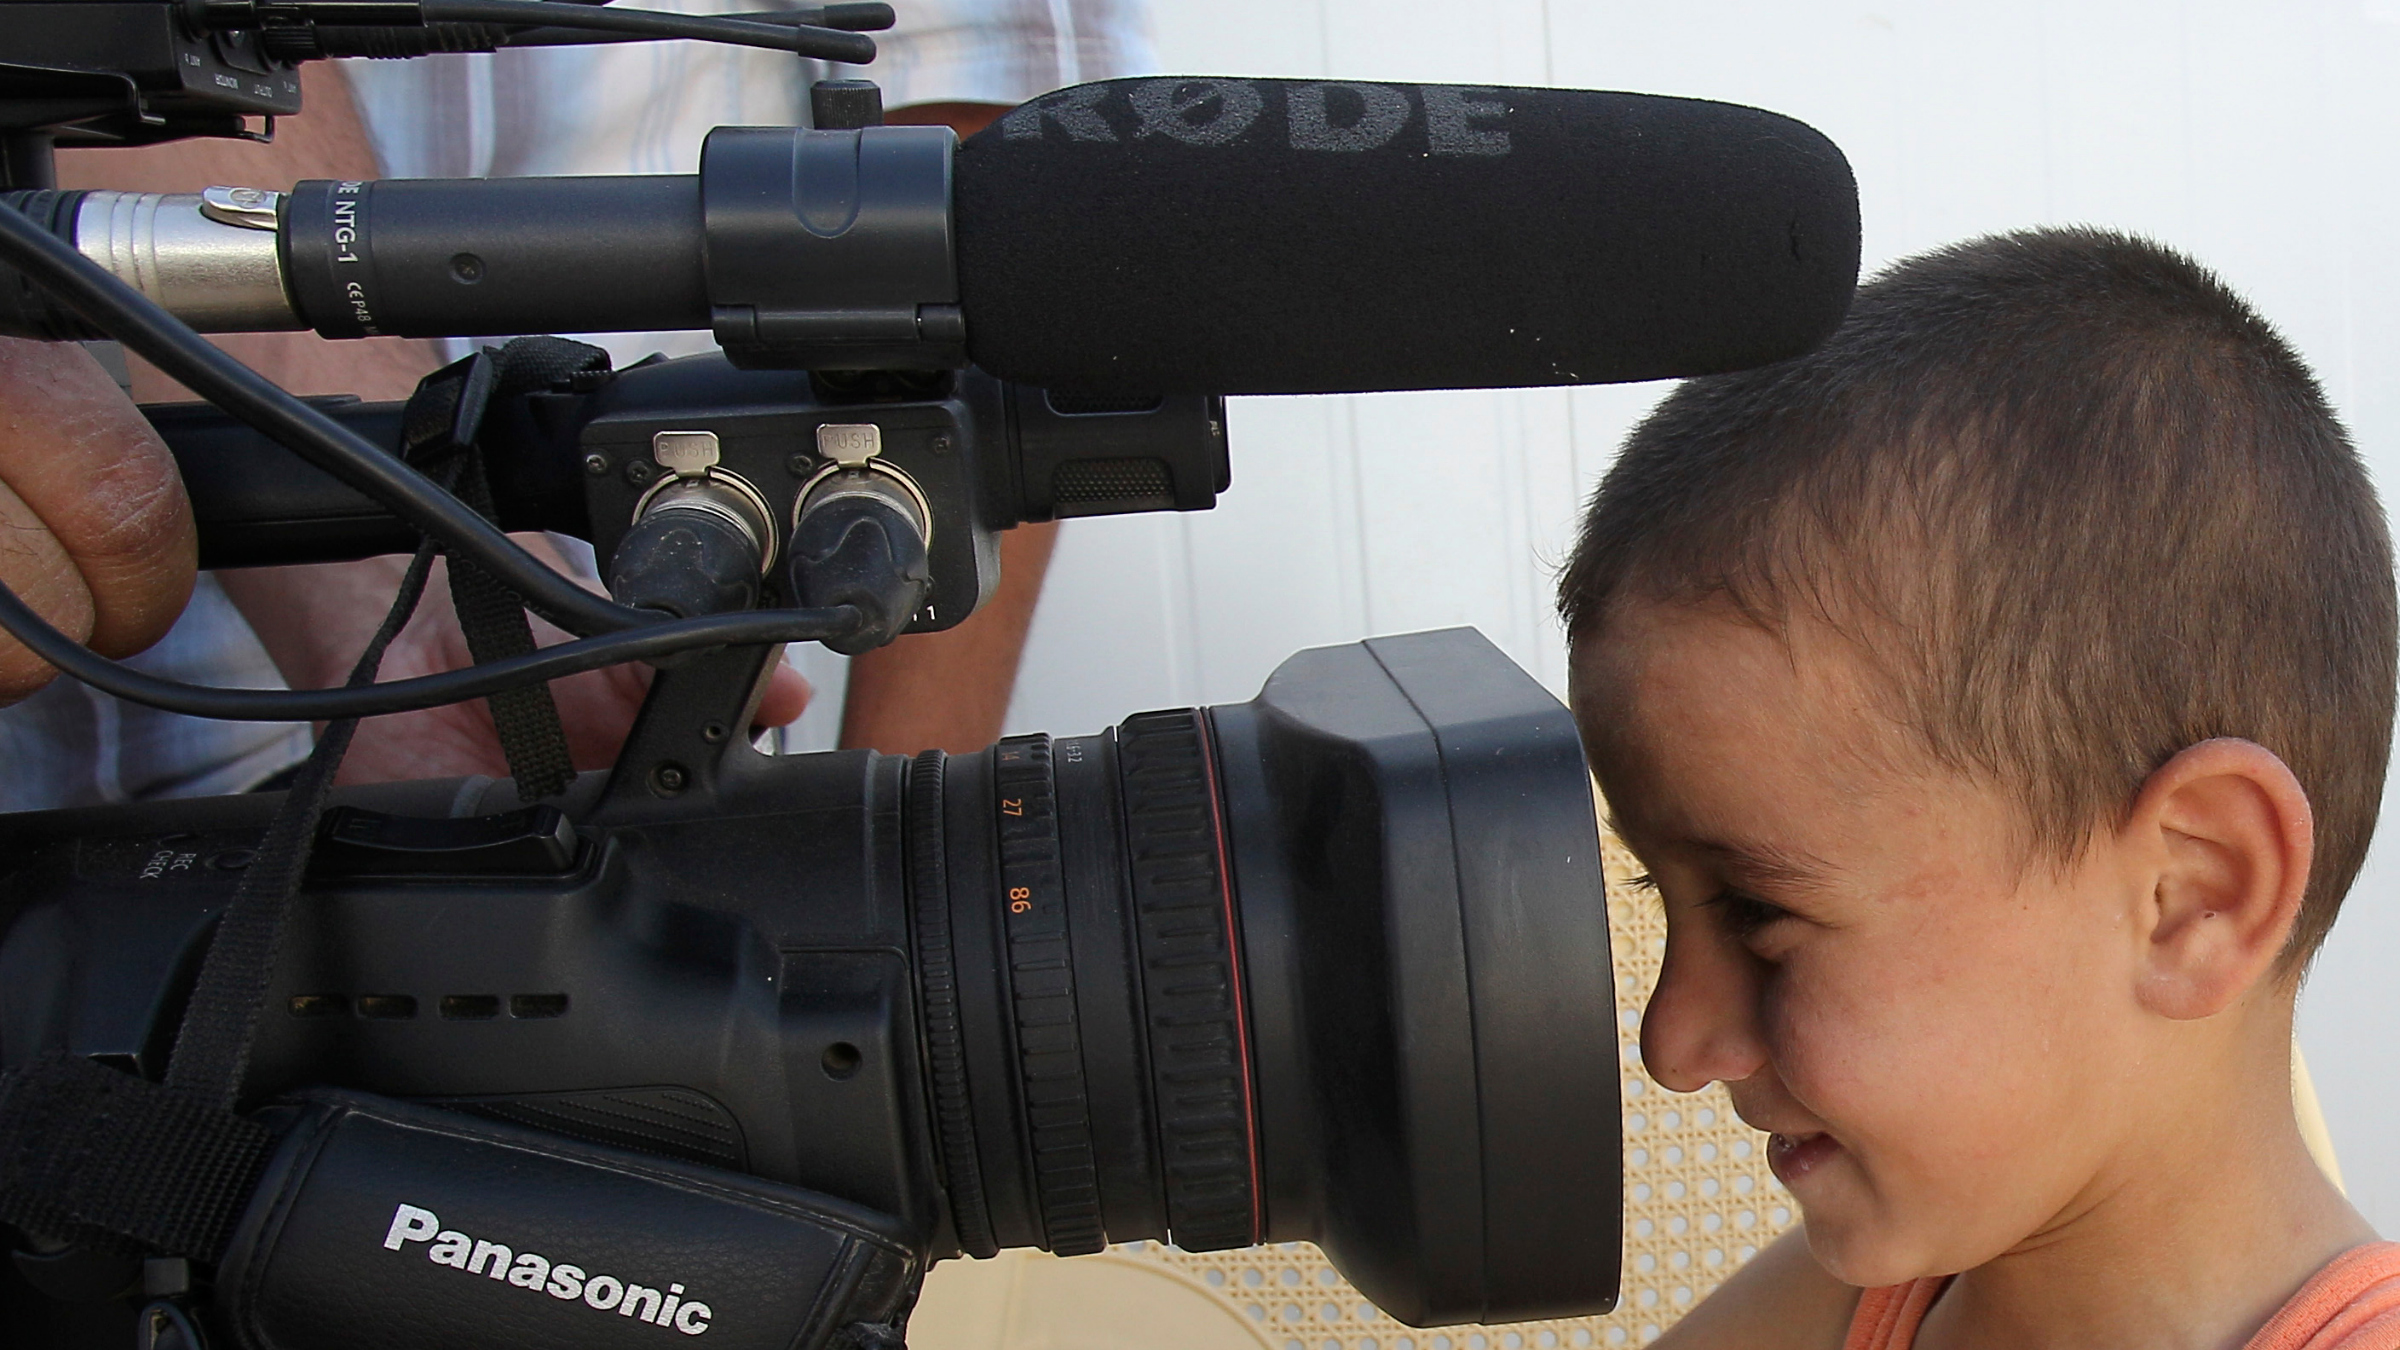 Child looking at a camera